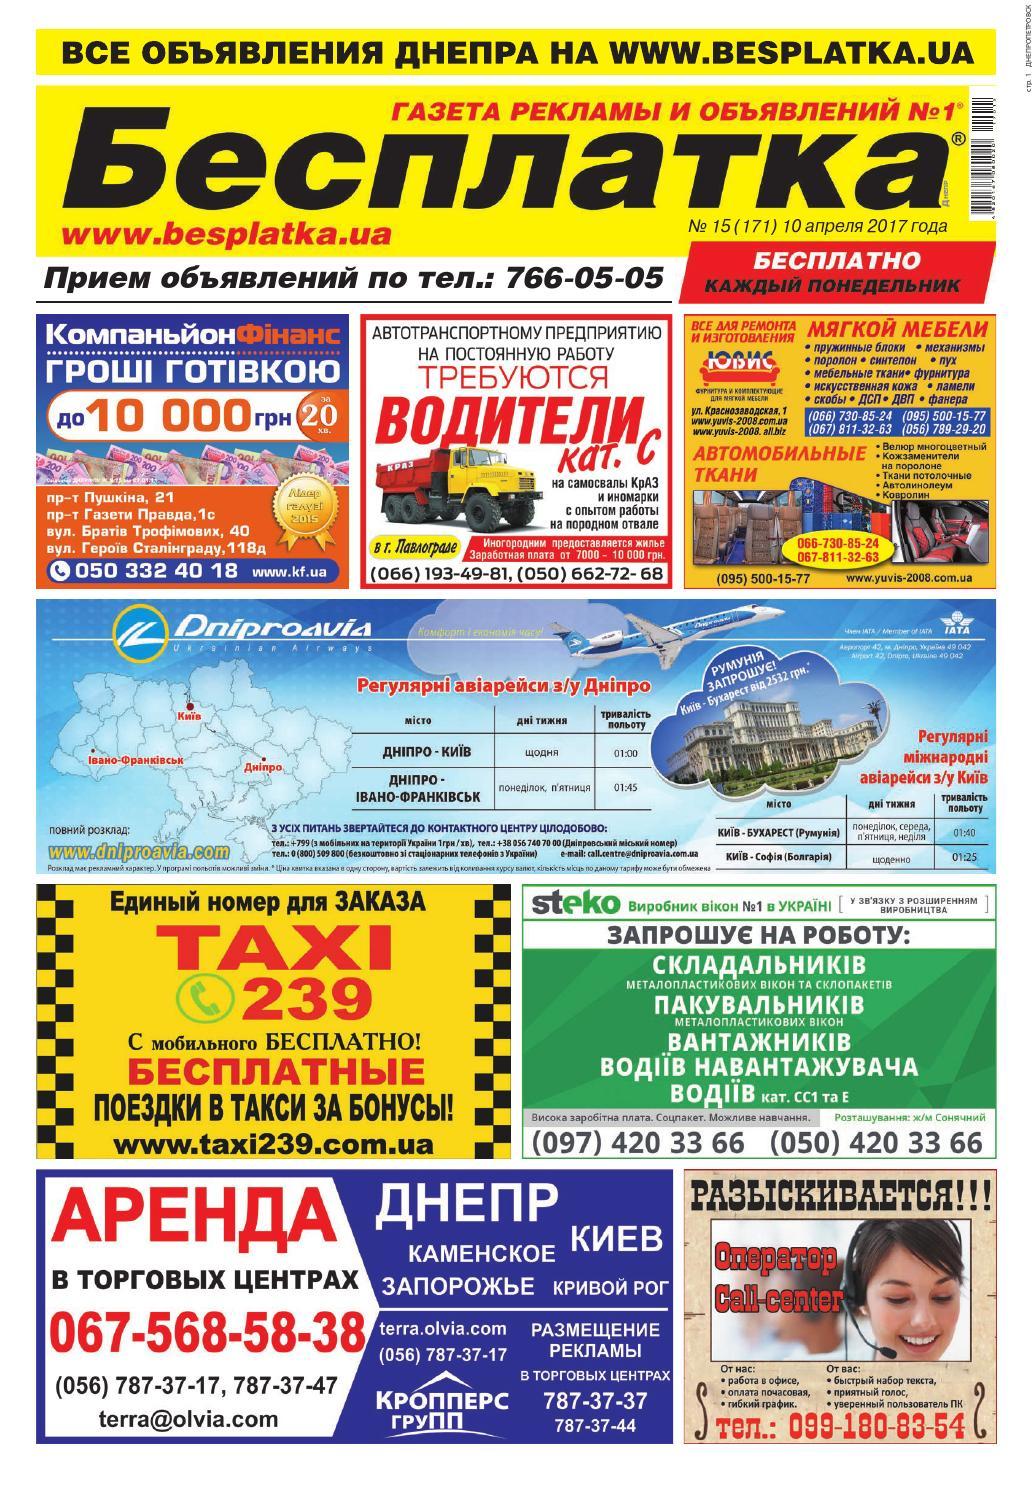 Besplatka  15 Днепр by besplatka ukraine - issuu b64f28c40b295